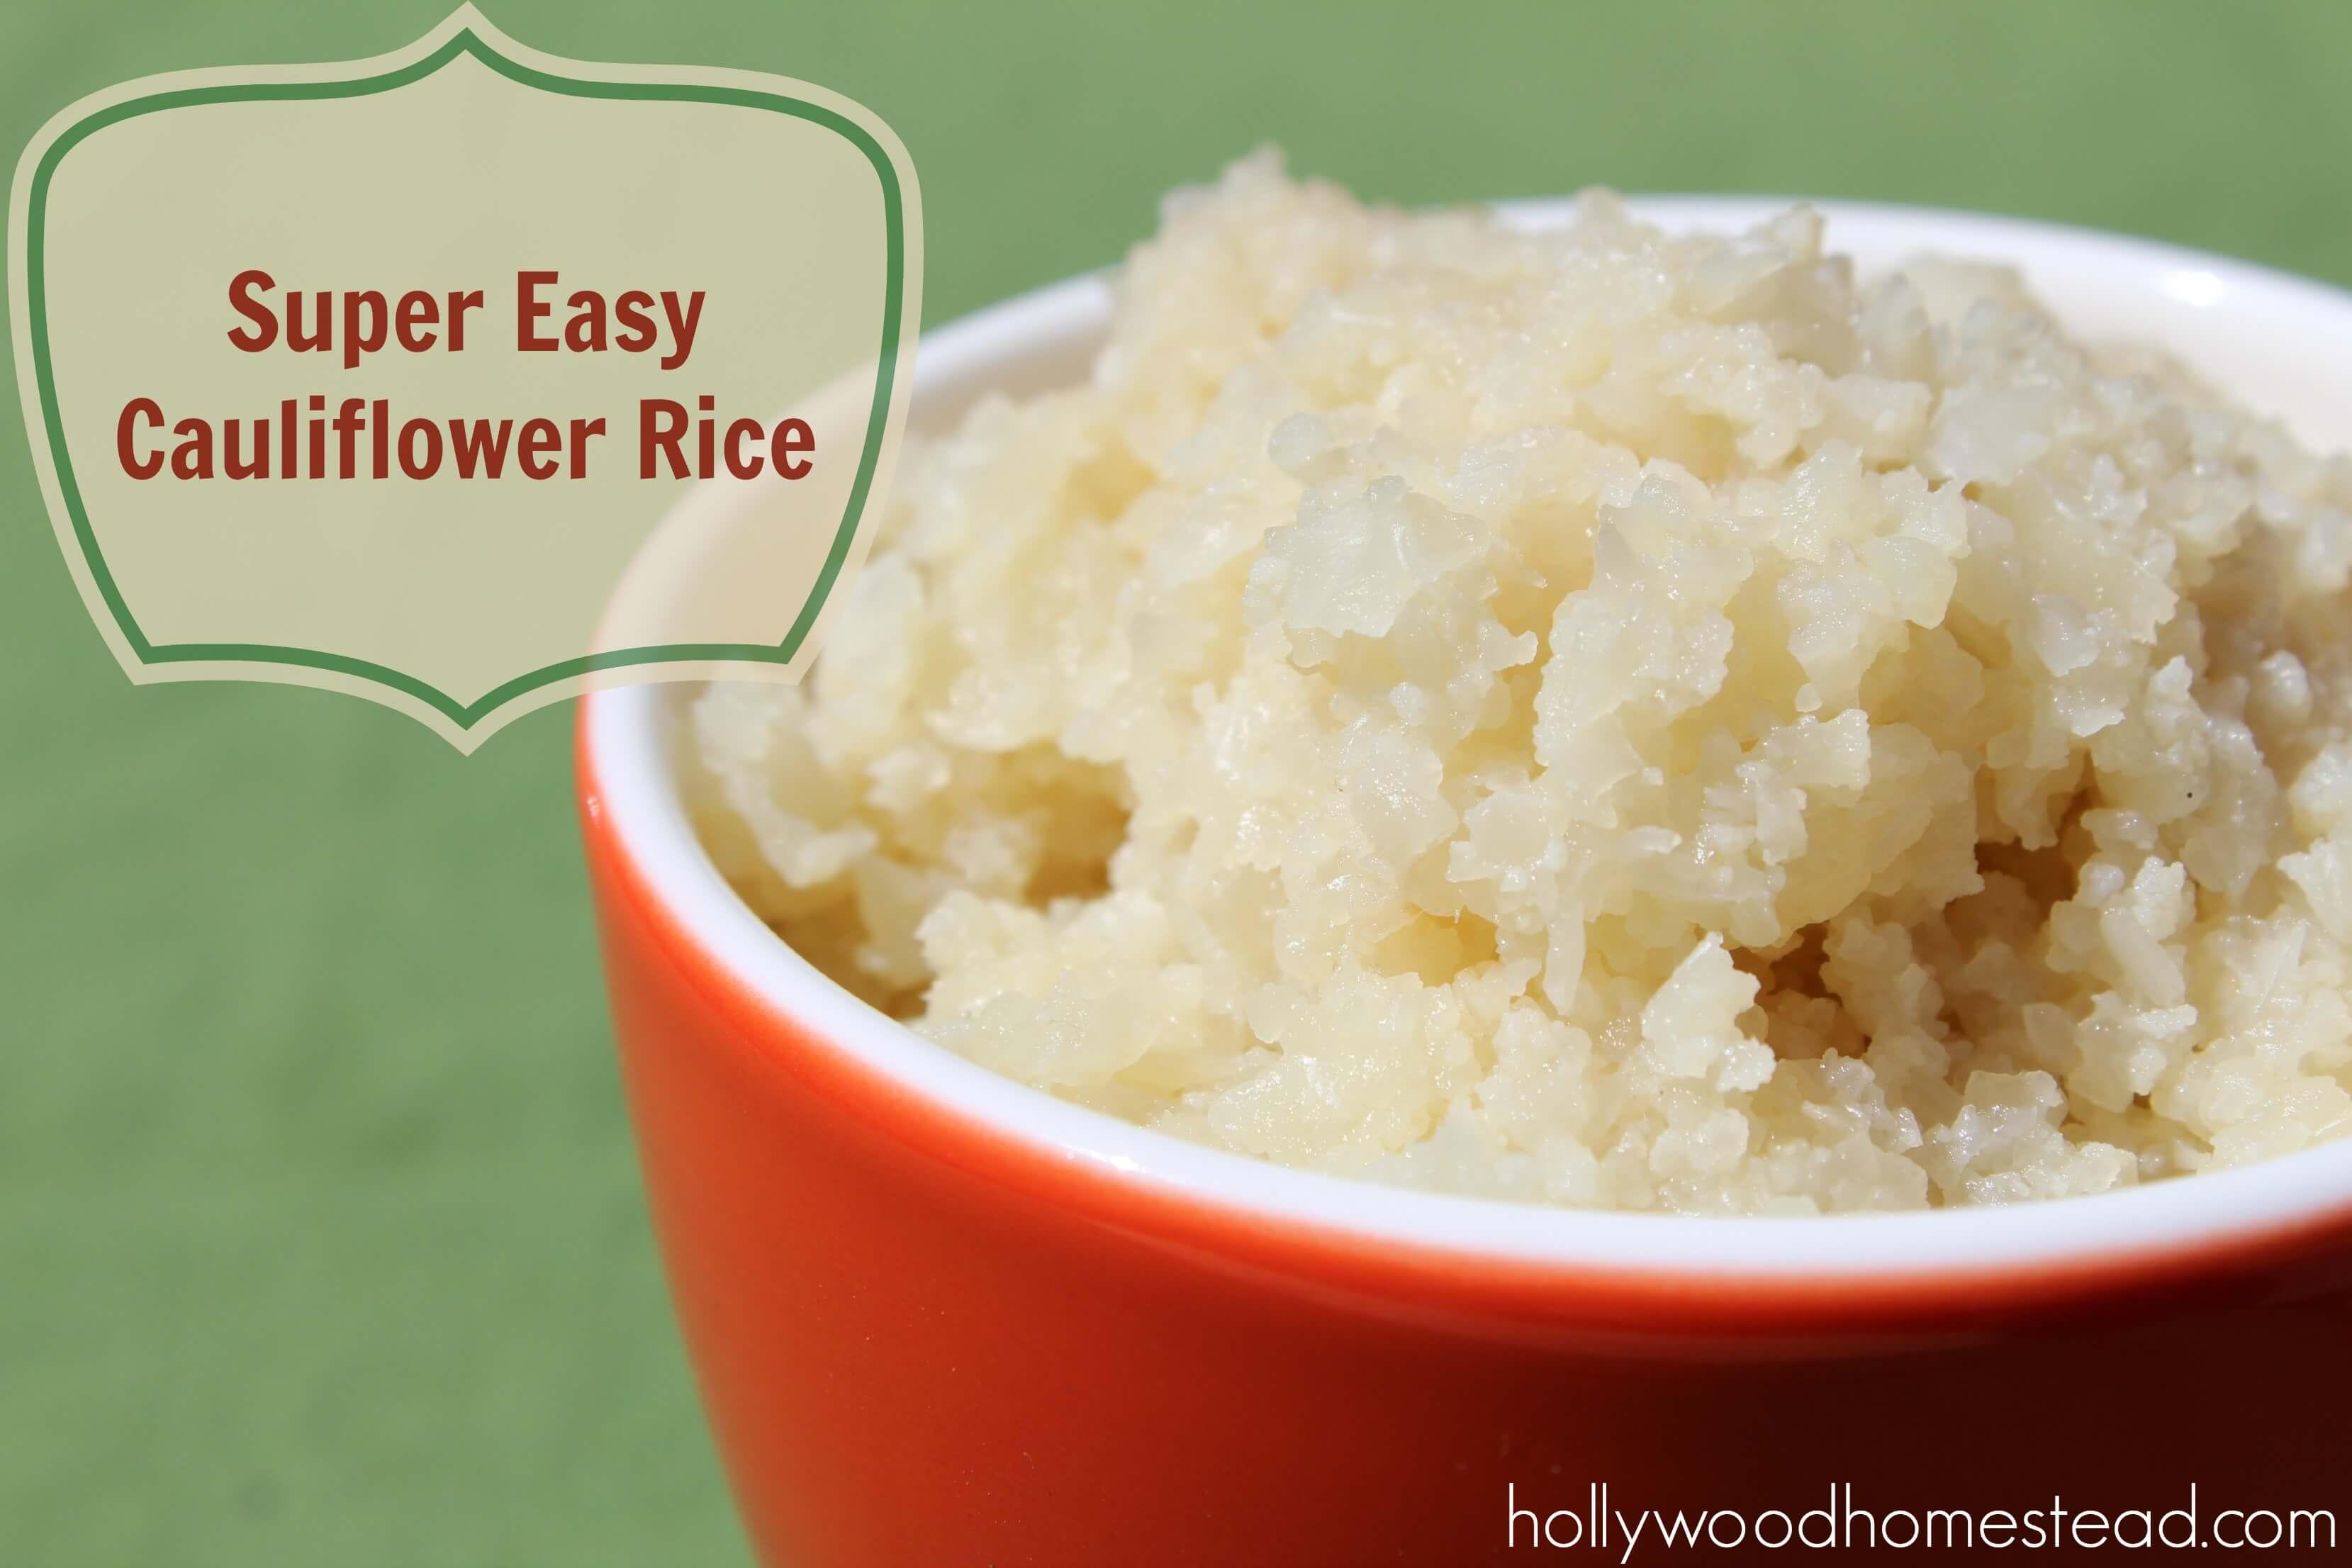 Super Easy Paleo Cauliflower Rice Recipe - Hollywood Homestead